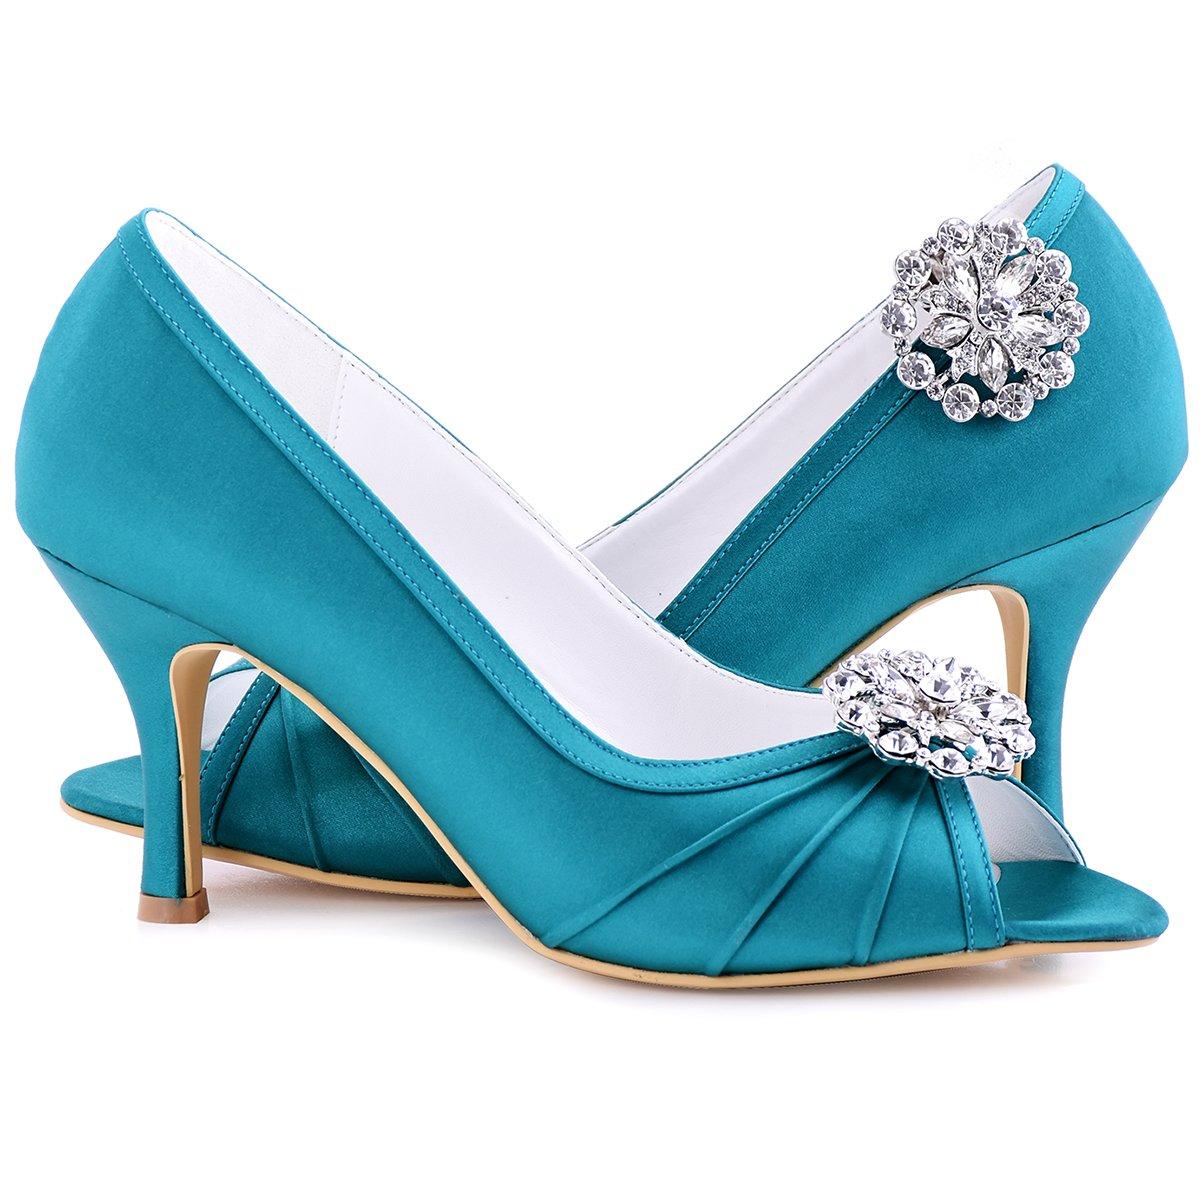 ElegantPark Fashion Clips AH Mujer Accesorios Rotonda Rhinstones zapato Clips 2 Pcs